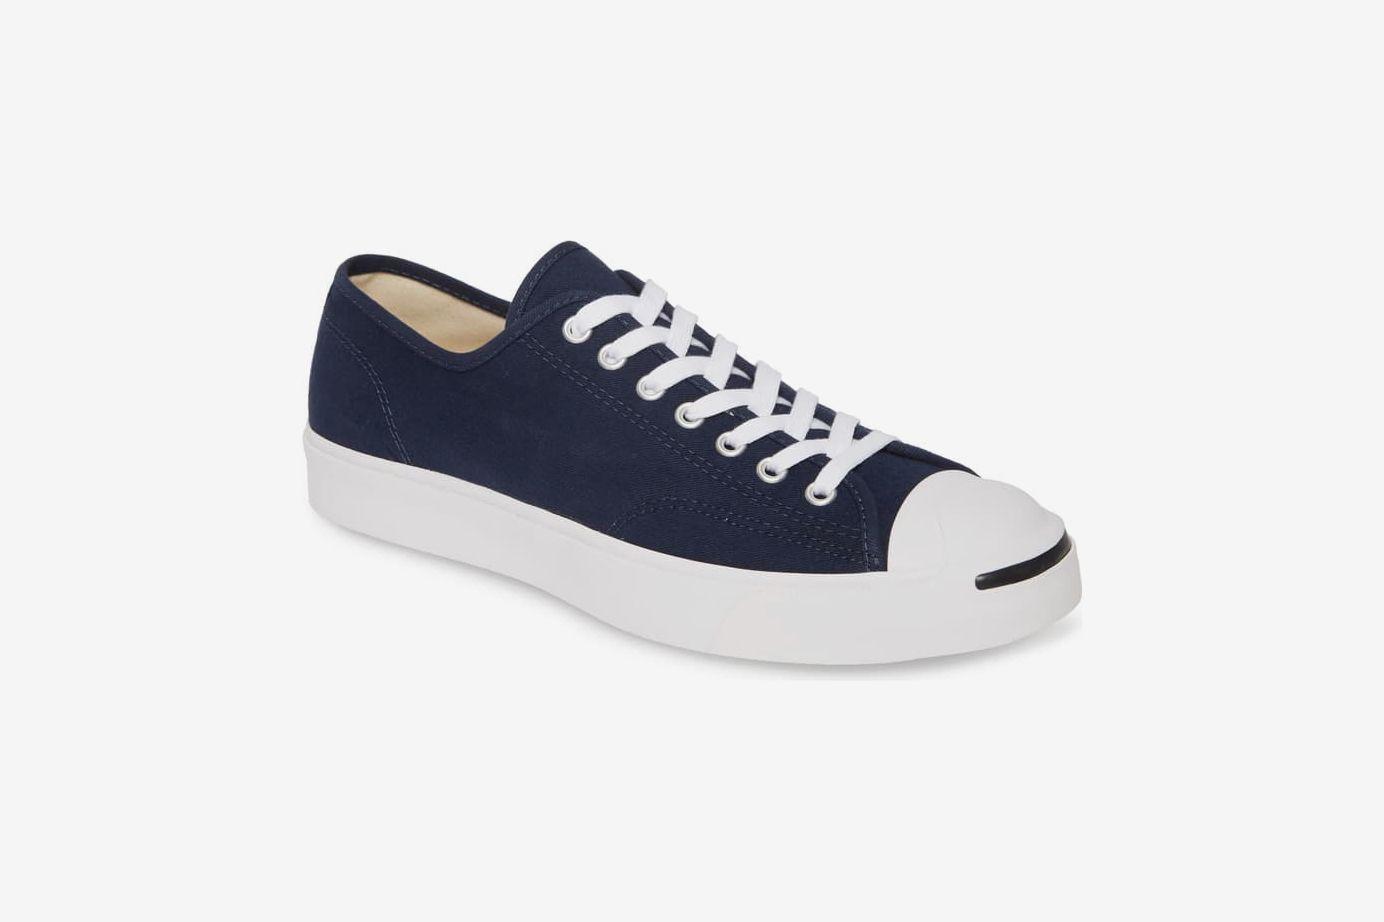 Jack Purcell Ox Sneaker